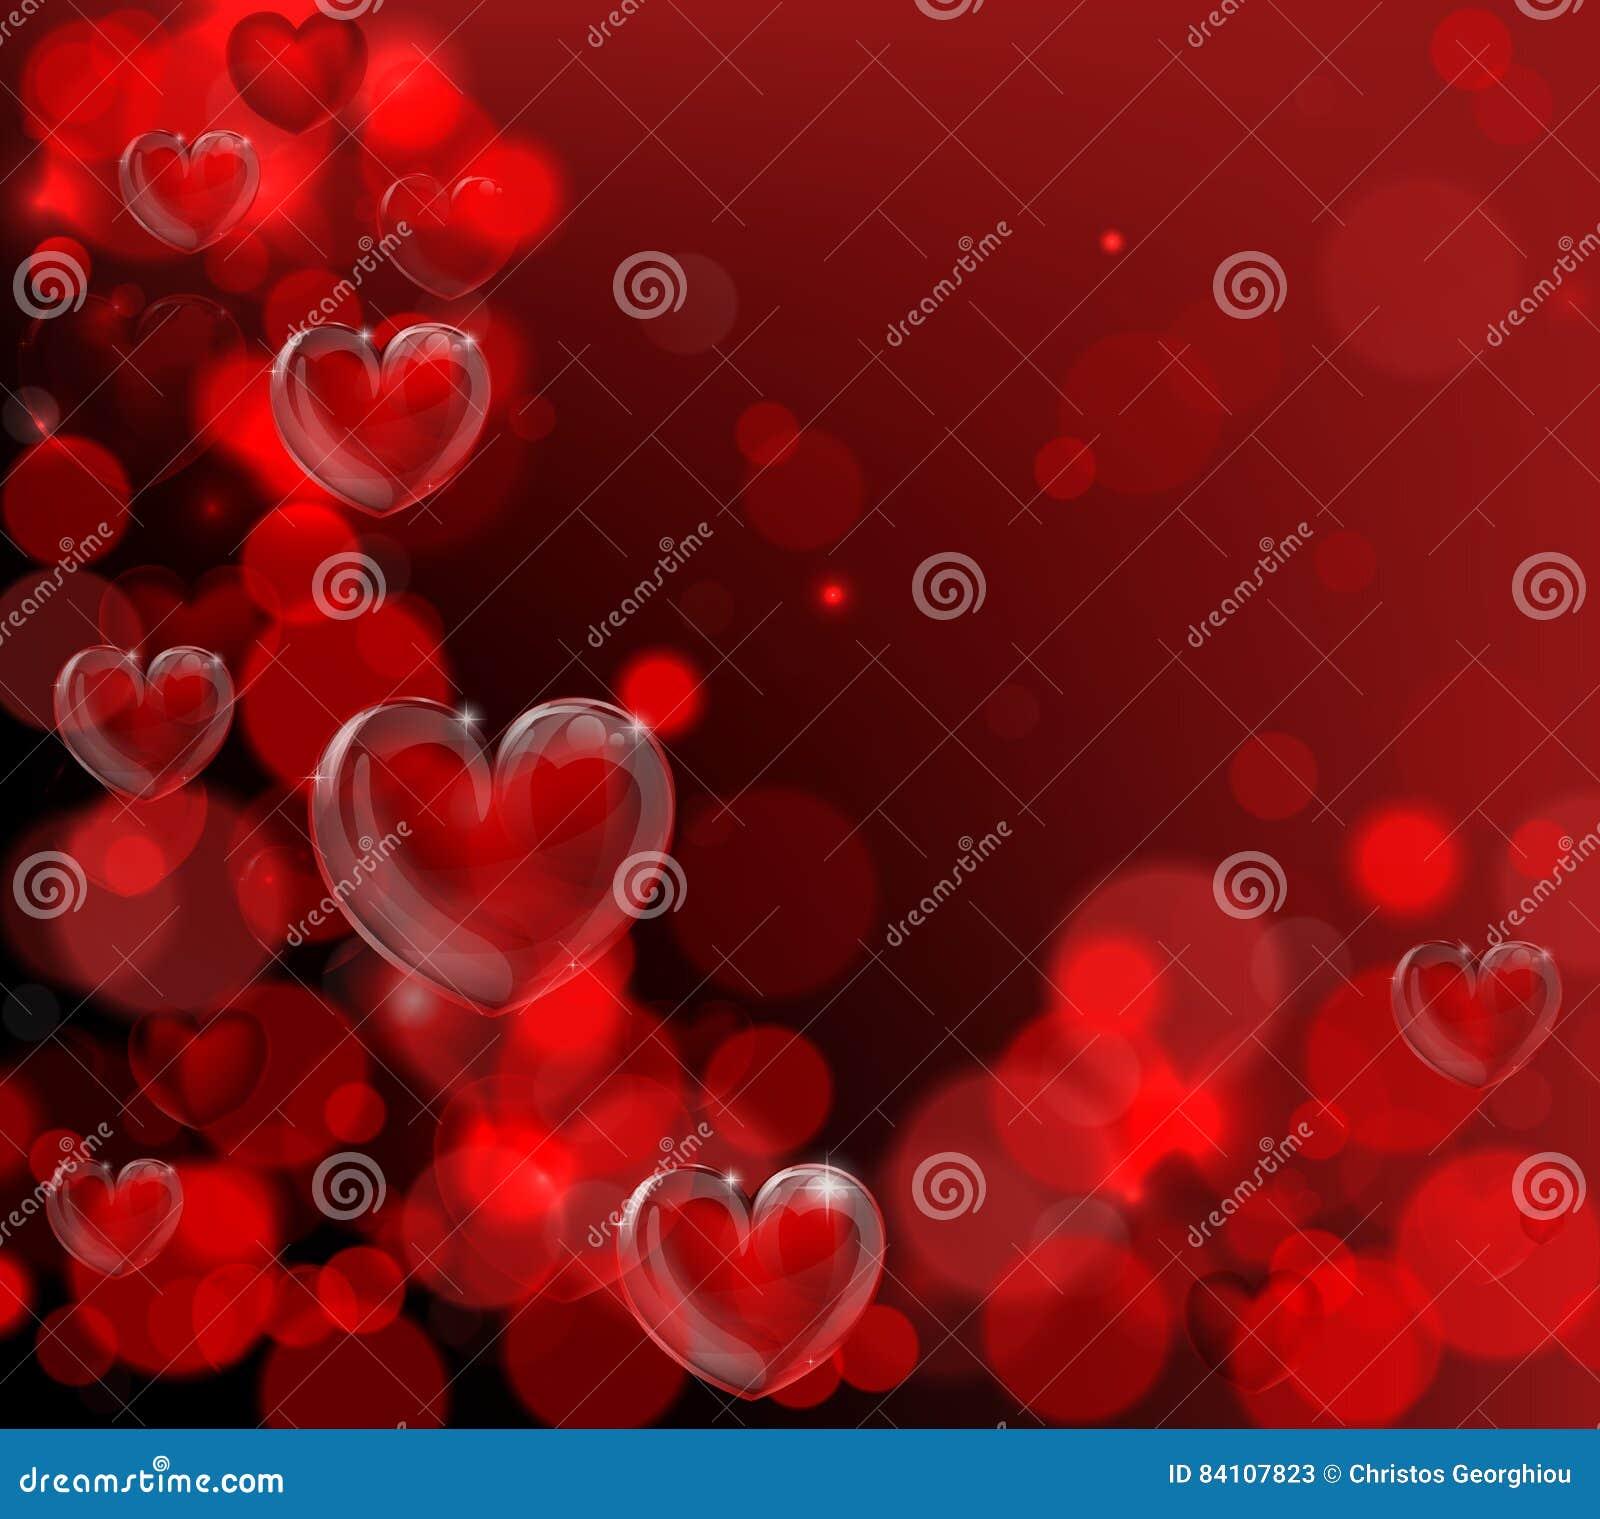 fd610b60da2 Valentines Day Corner Frame Background Stock Vector - Illustration ...